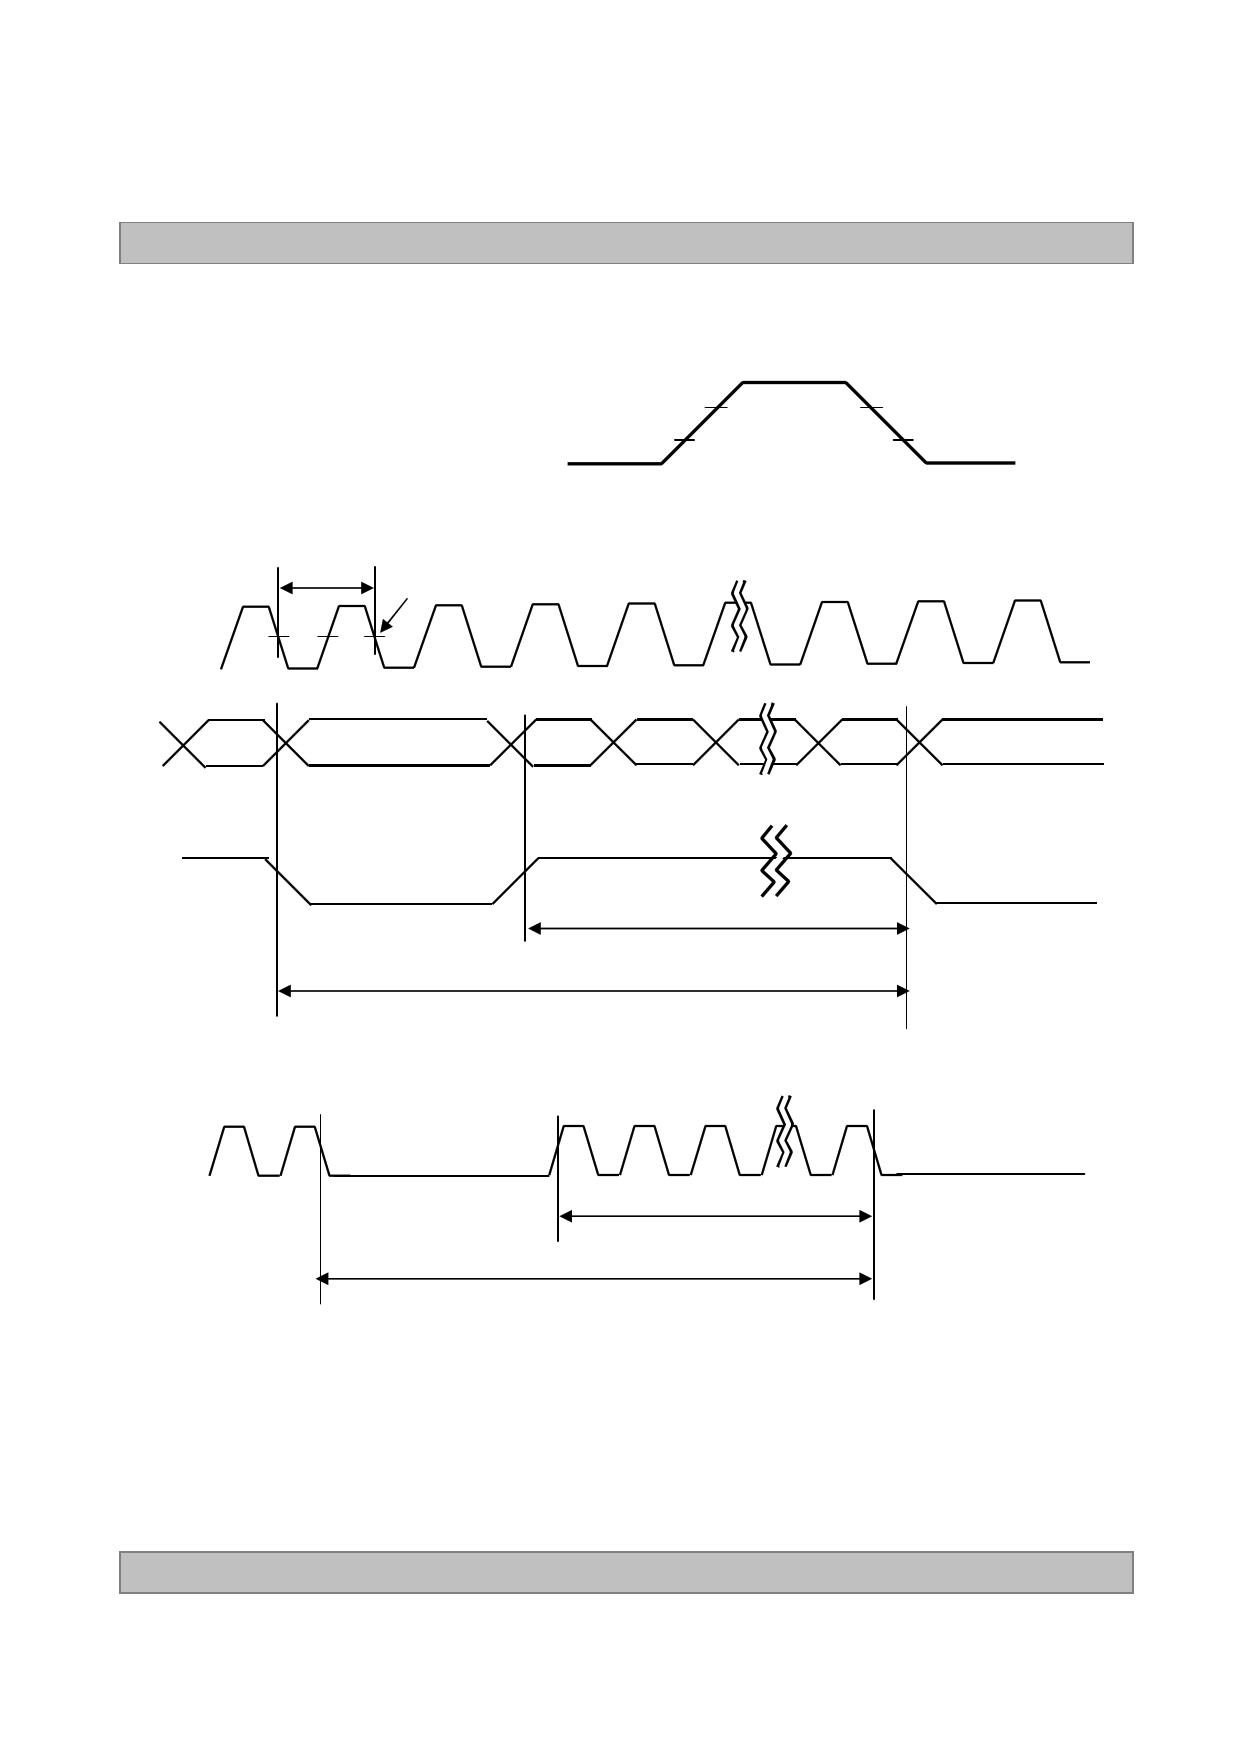 LC320DXN-SFR2 arduino